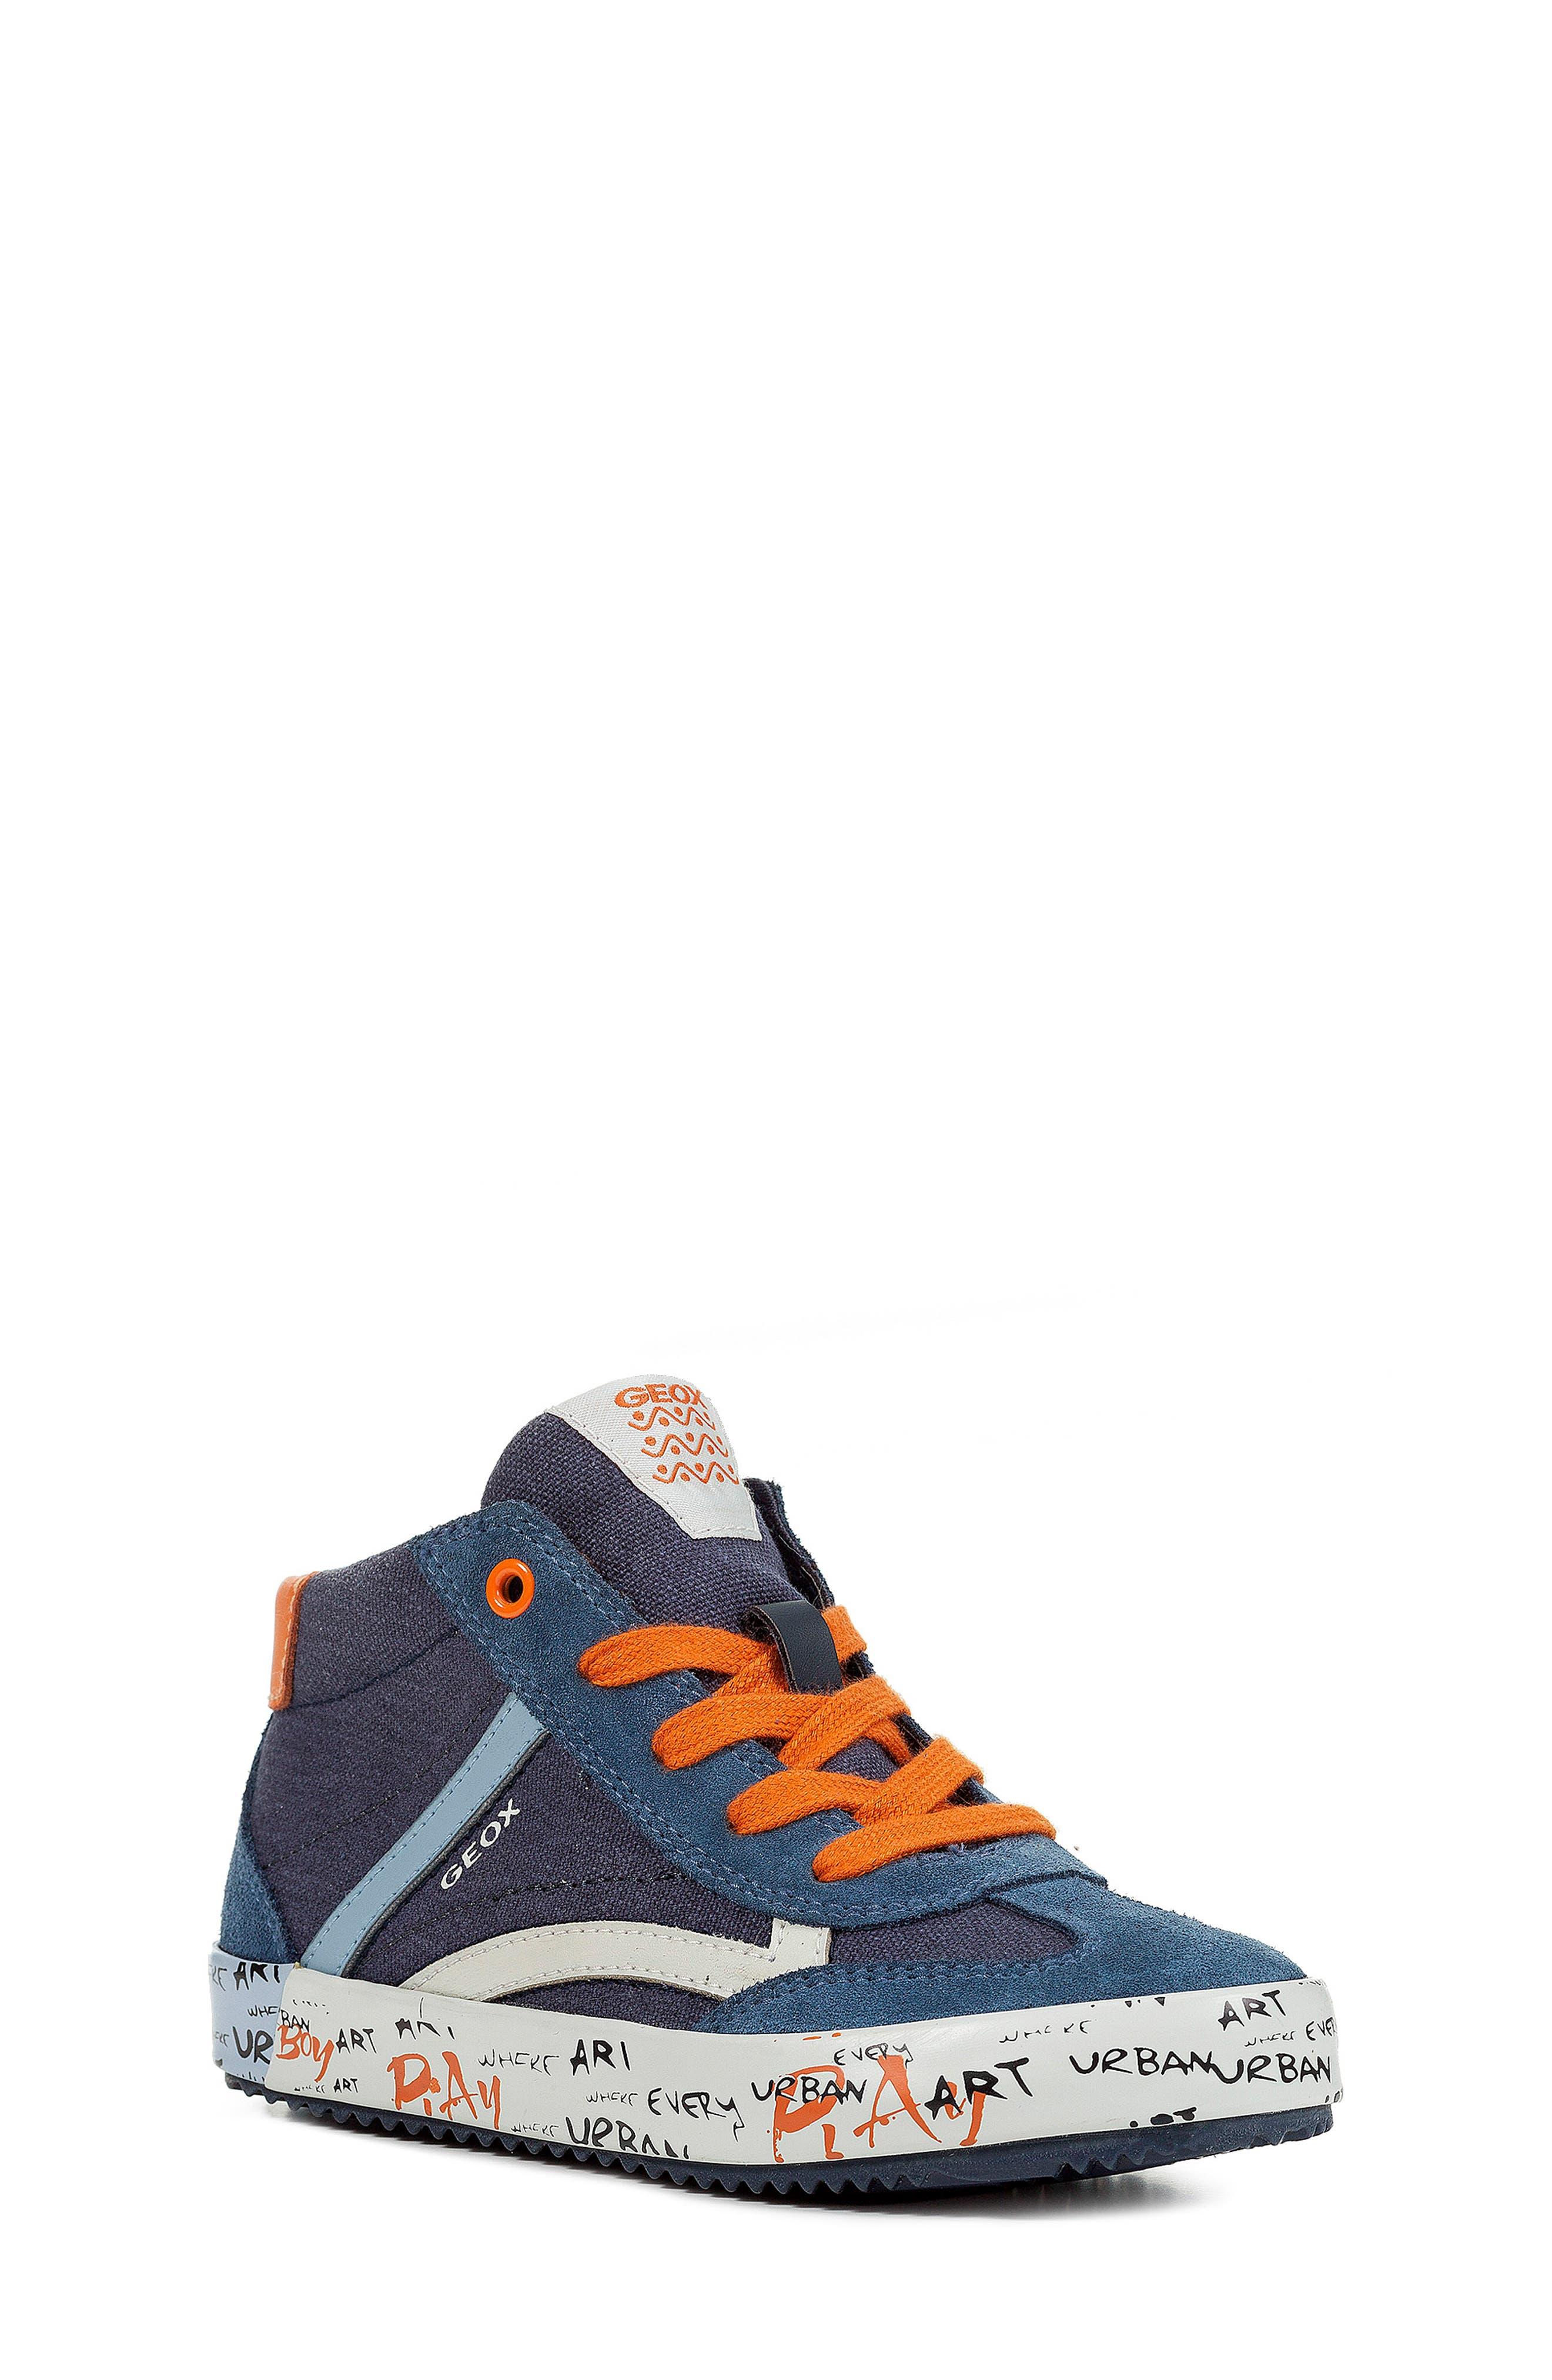 Alonisso 34 High Top Sneaker,                             Main thumbnail 1, color,                             NAVY/ DARK ORANGE